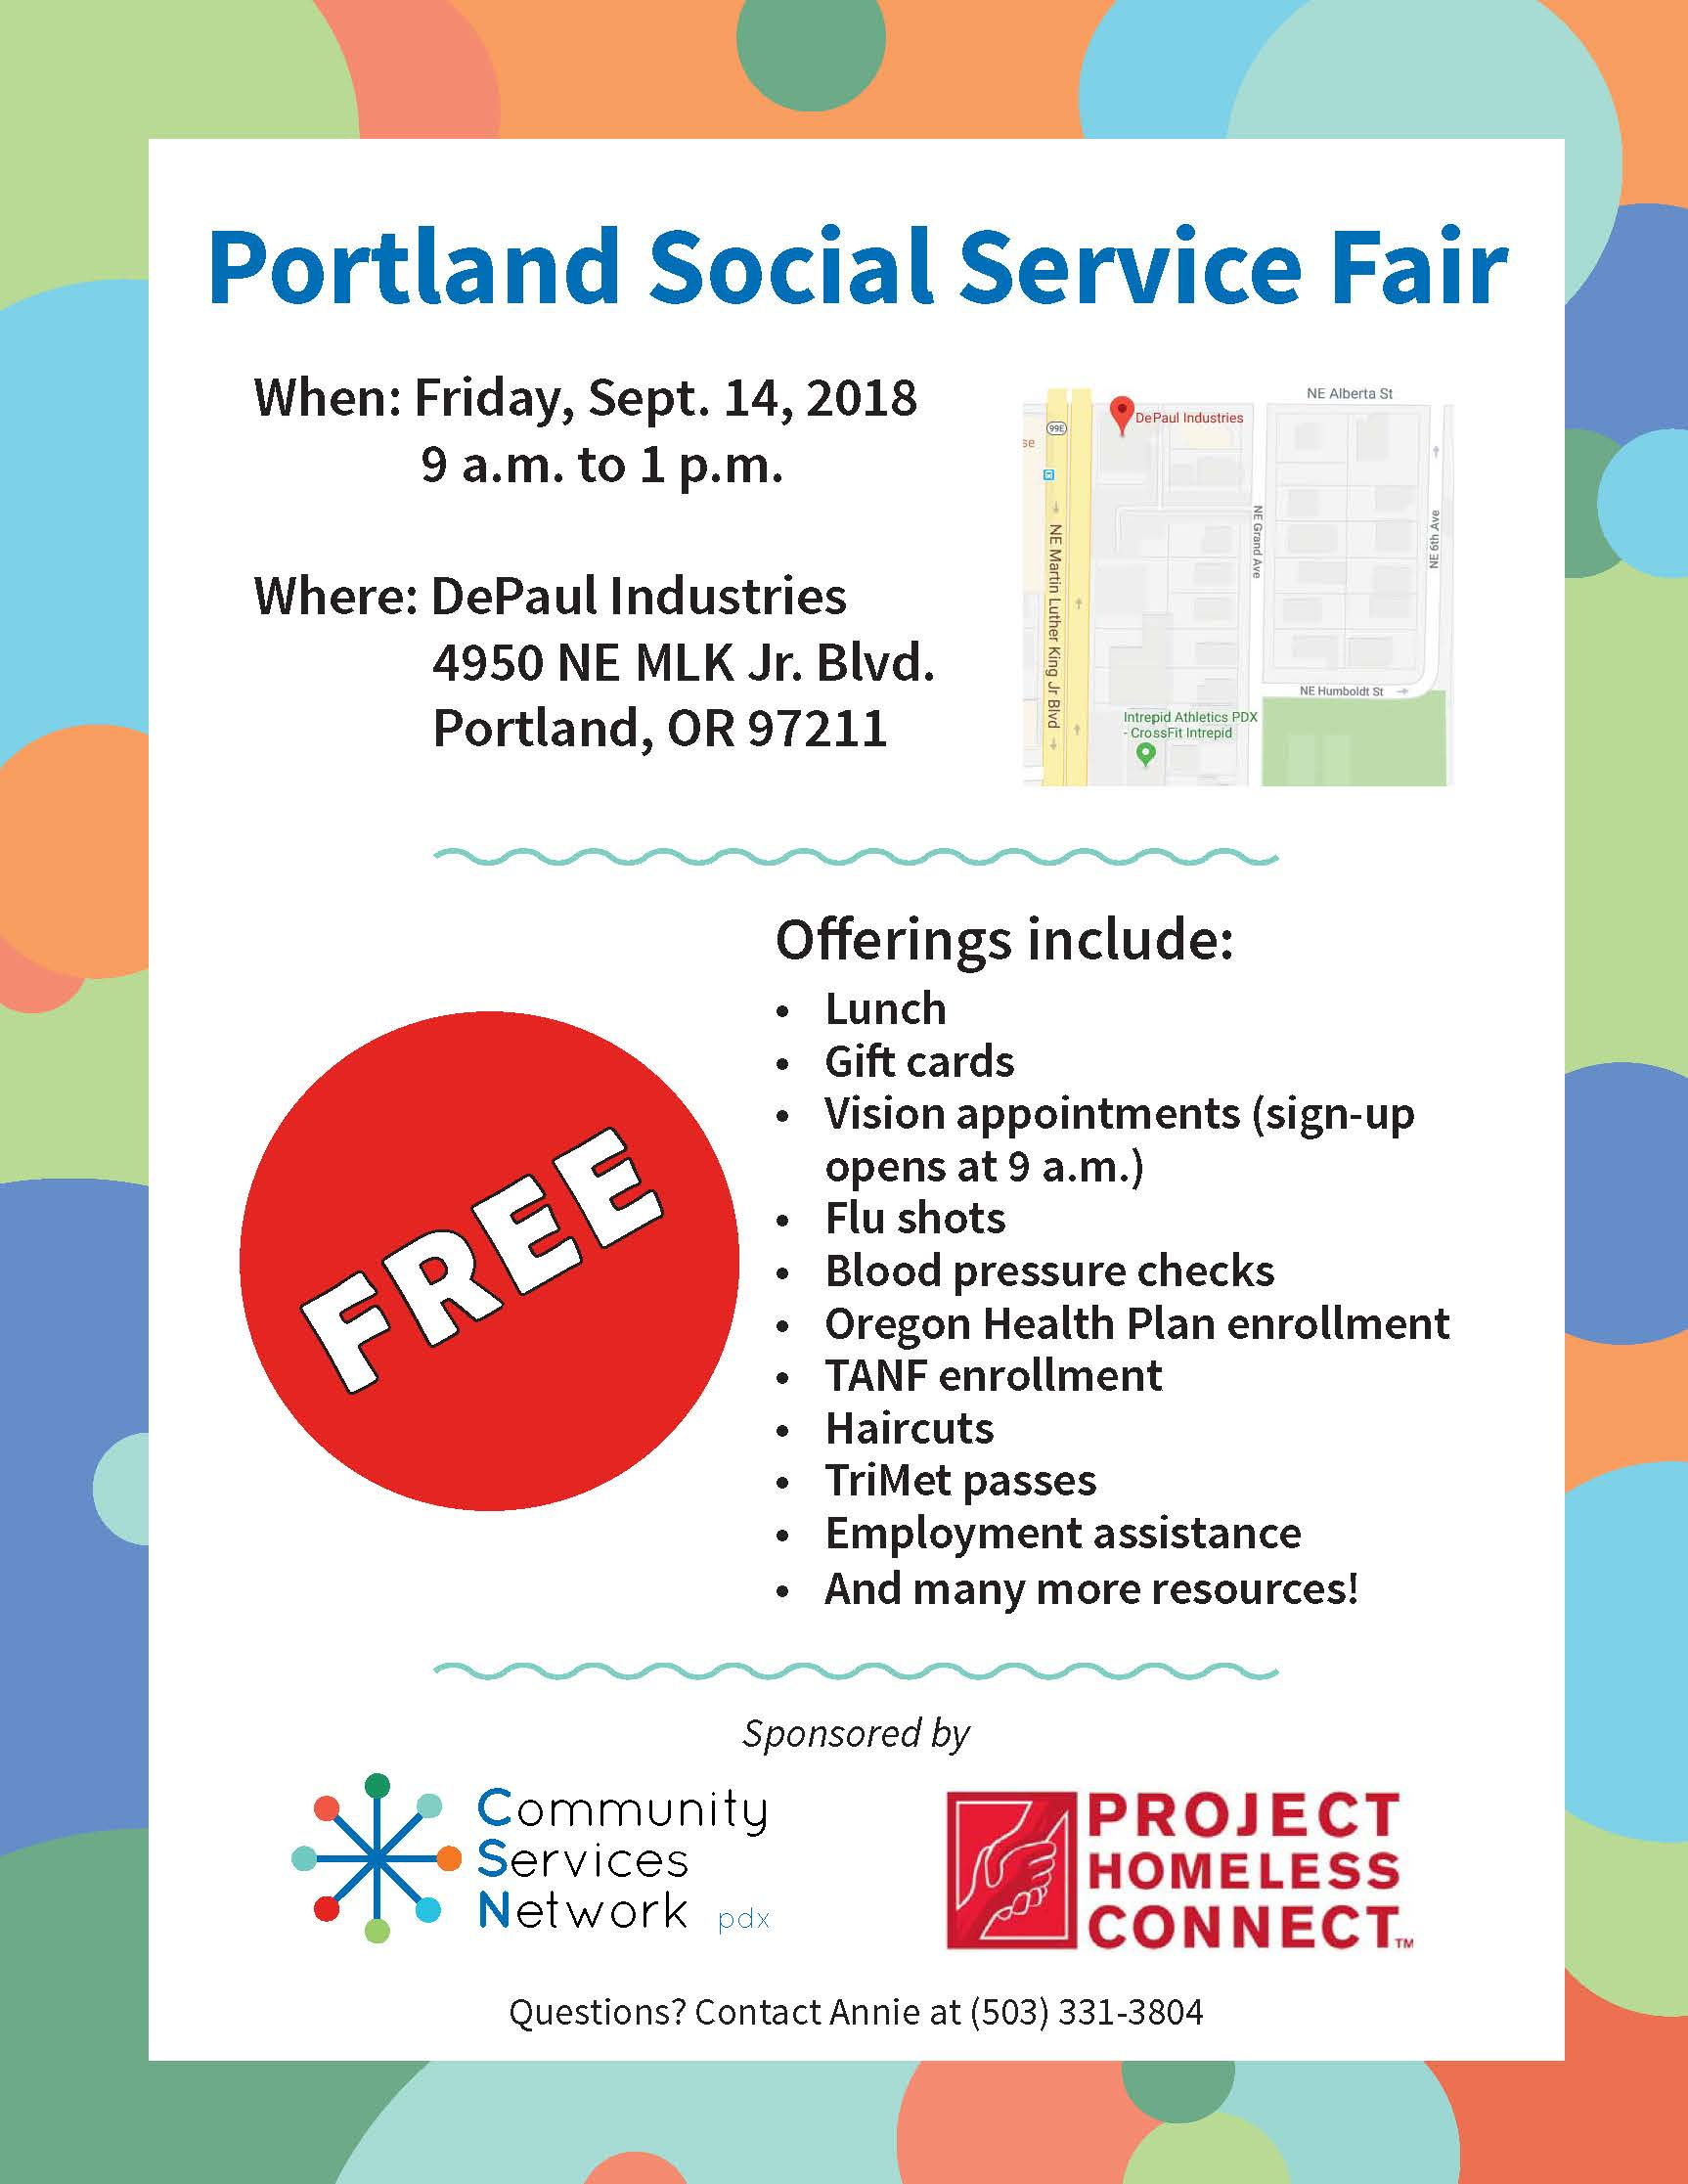 DePaul Industries Hosting Portland Social Service Fair Sept